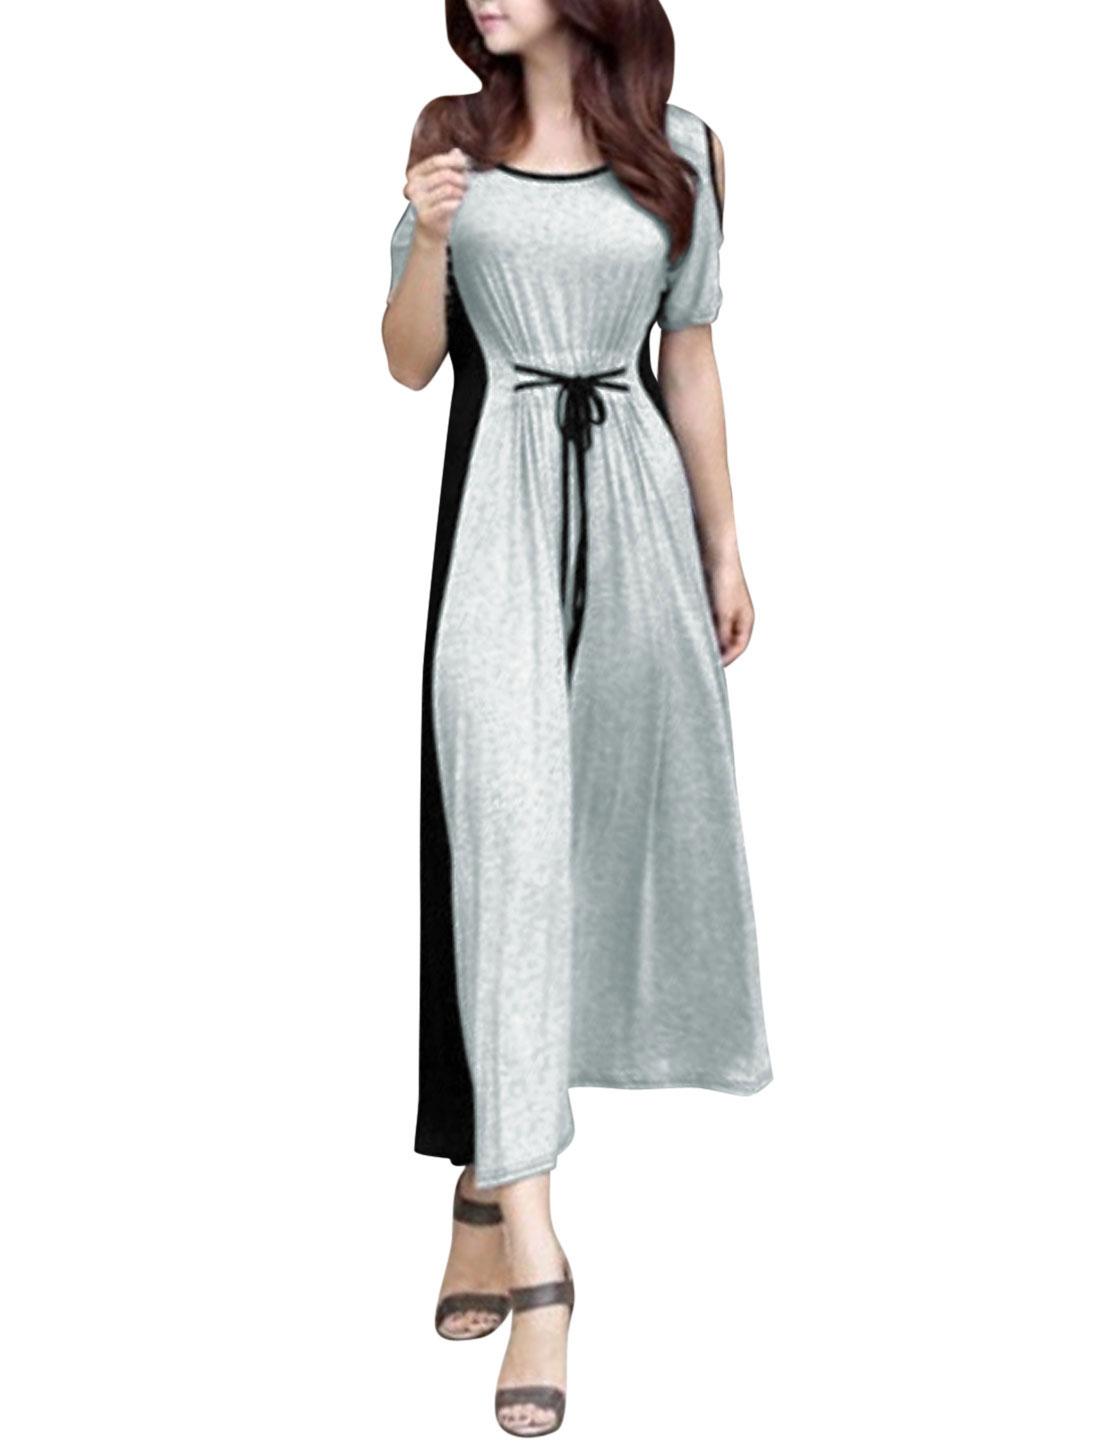 Ladies Short Sleeve Cut Out Shoulder Color Block Maxi Dress Gray Black XS